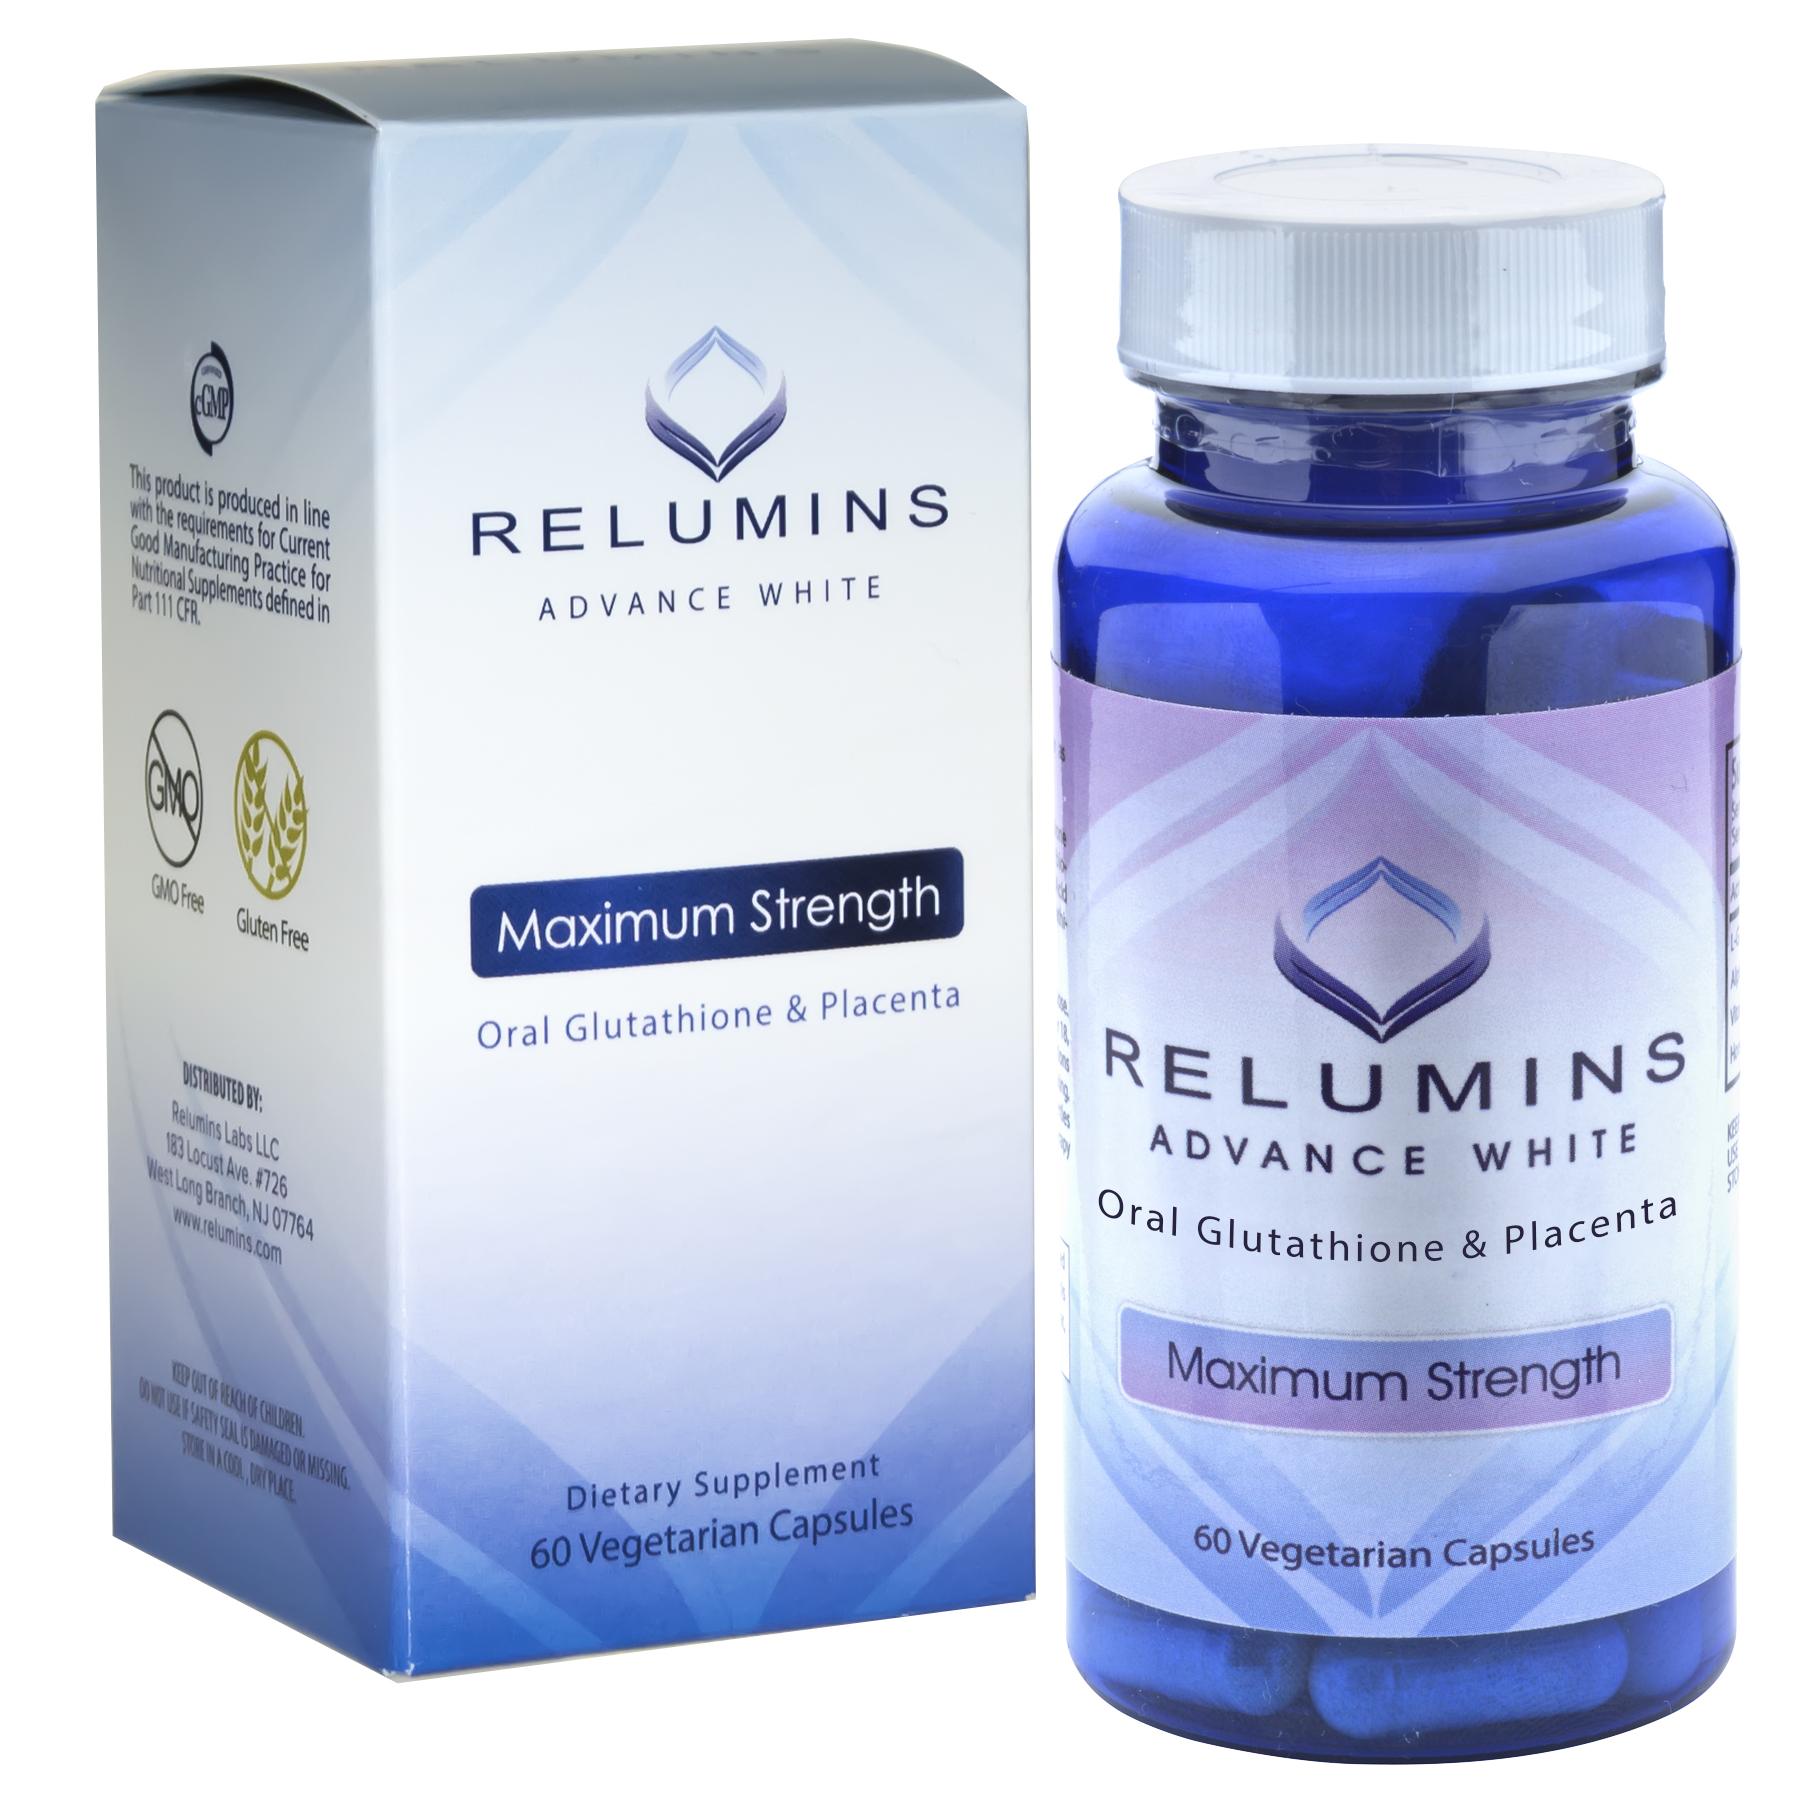 Authentic Relumins Advanced White Oral Whitening Formula